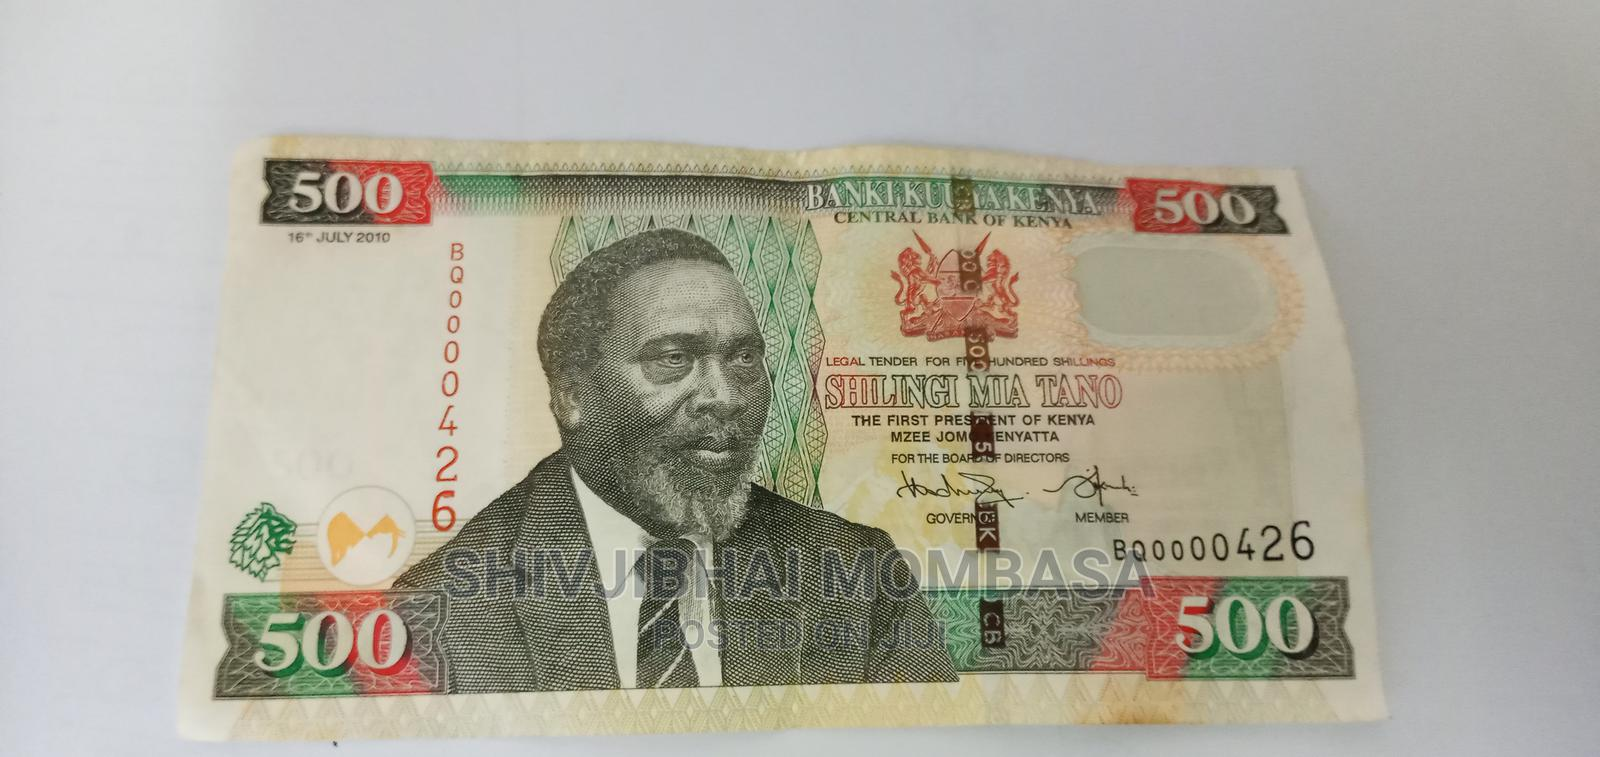 Unik 500 Kenya Shilling Number Note